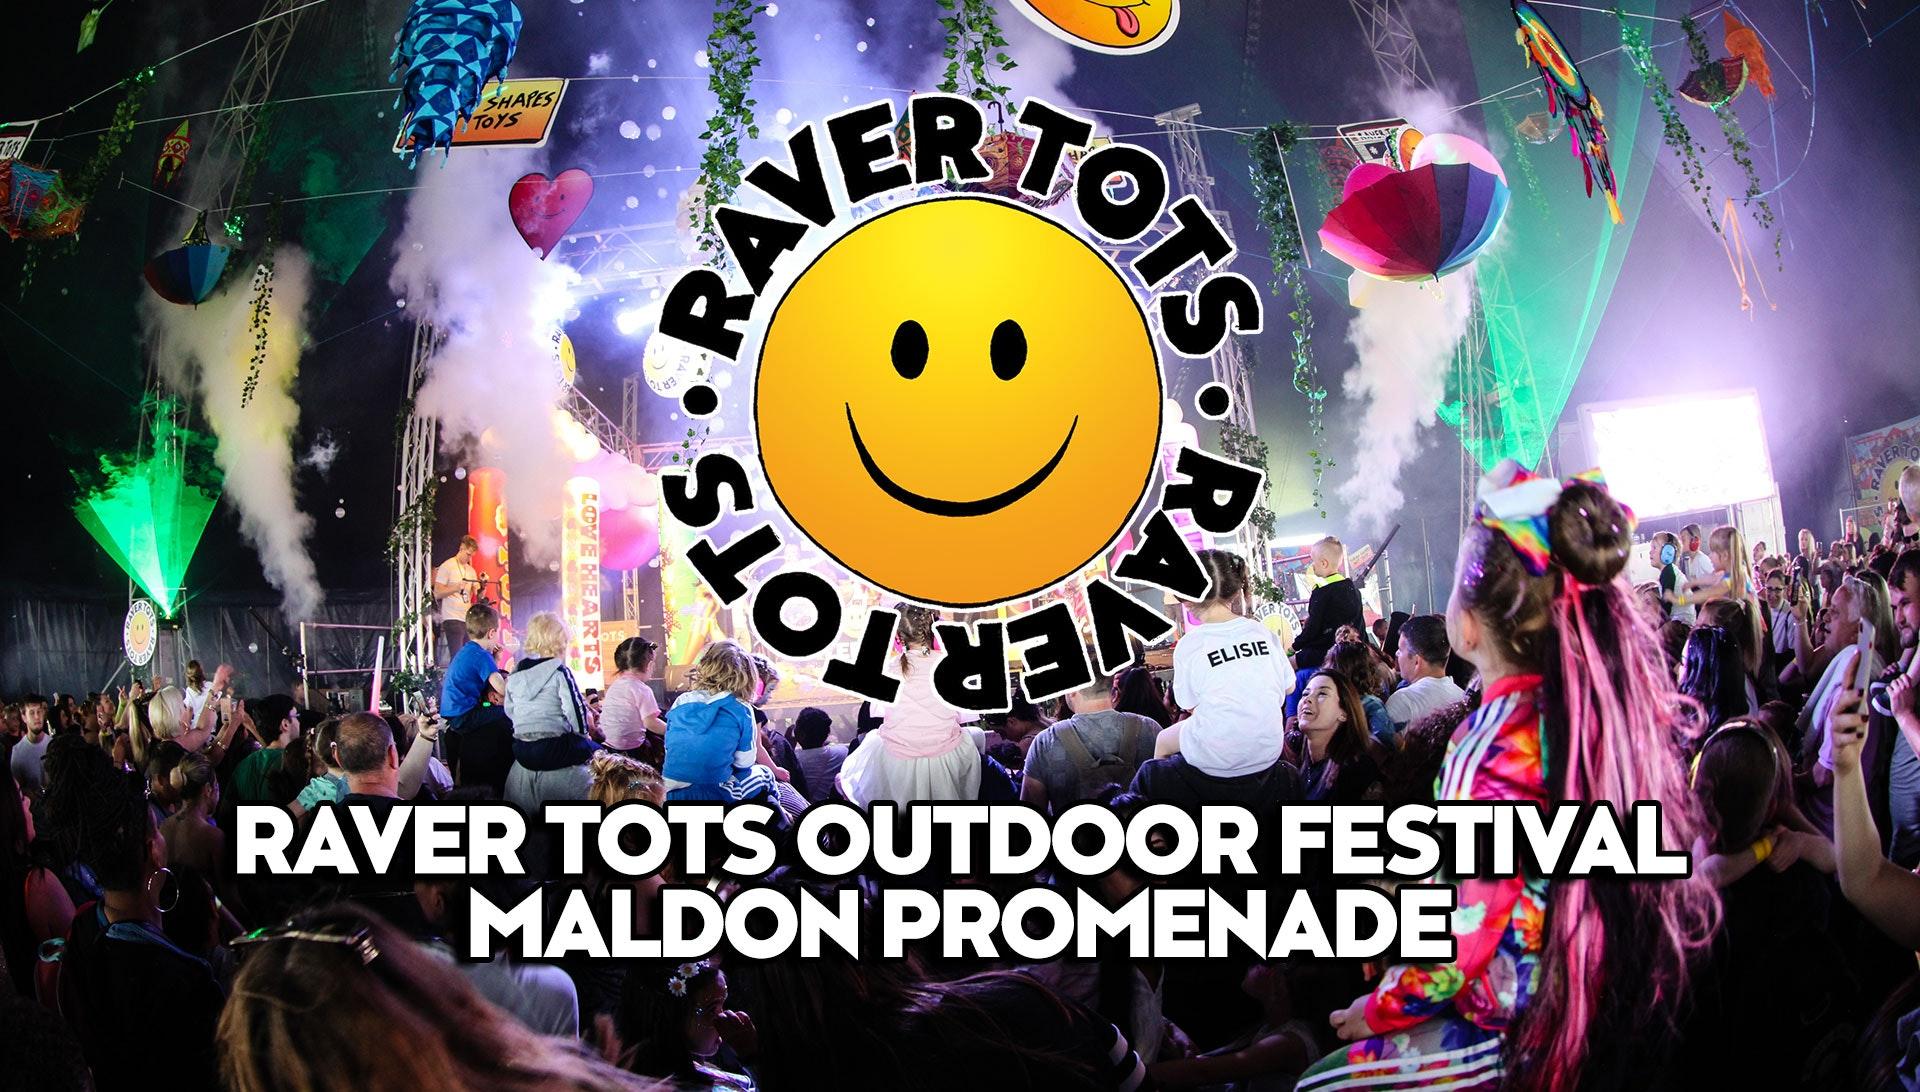 The Worlds Biggest Ever Raver Tots Outdoor Festival – Maldon Promenade